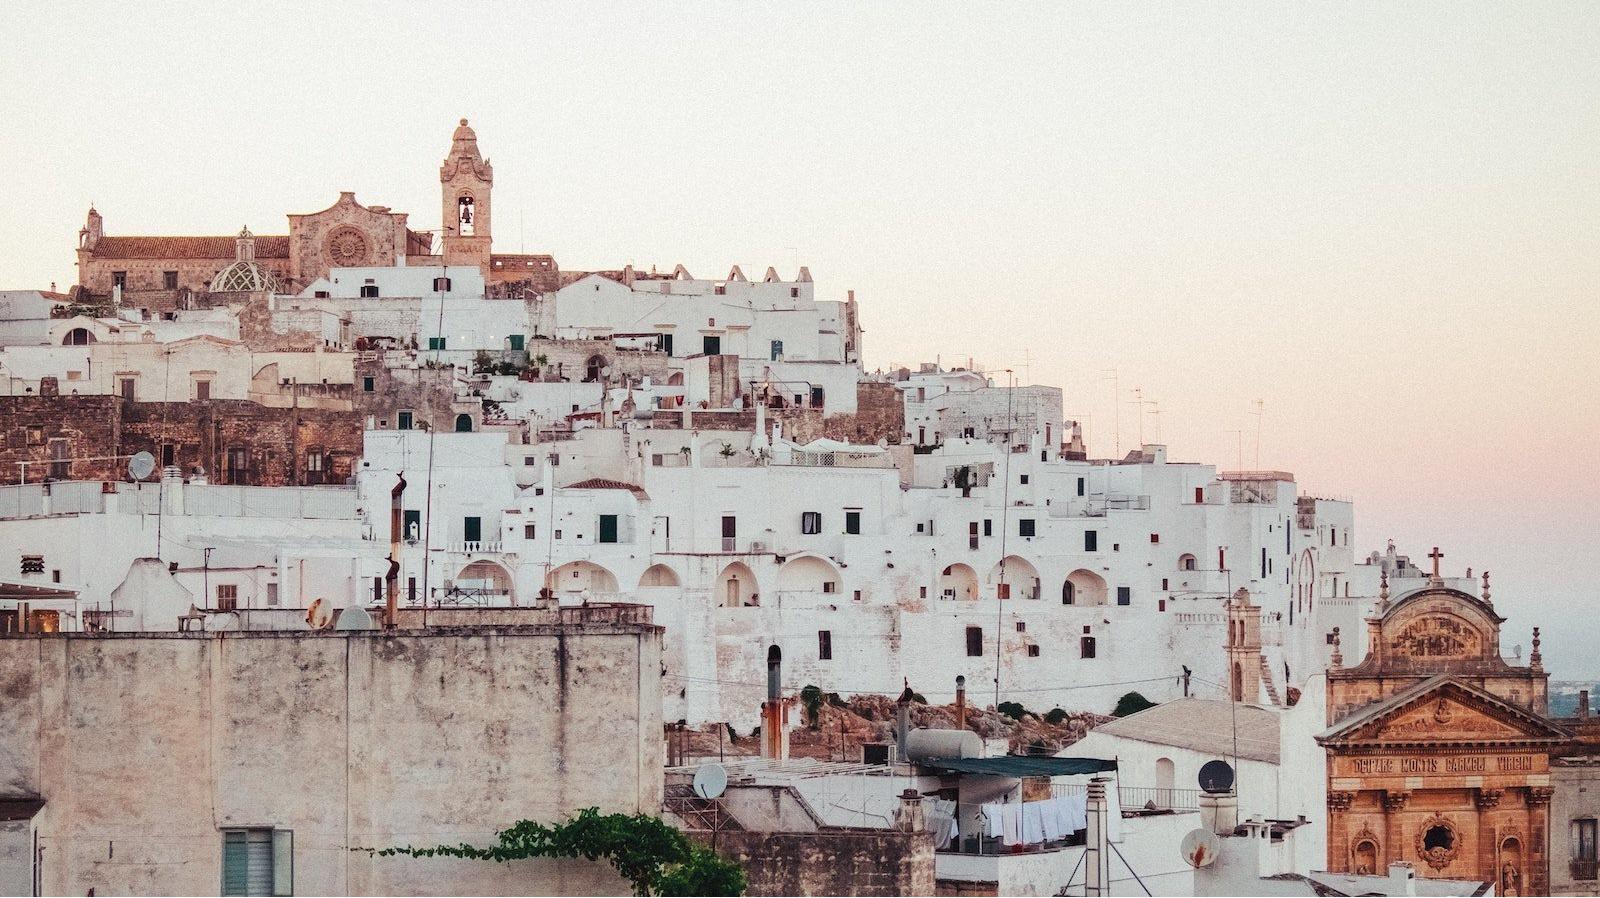 Ostuni, Puglia, region of Apulia; The White City - Sheet1